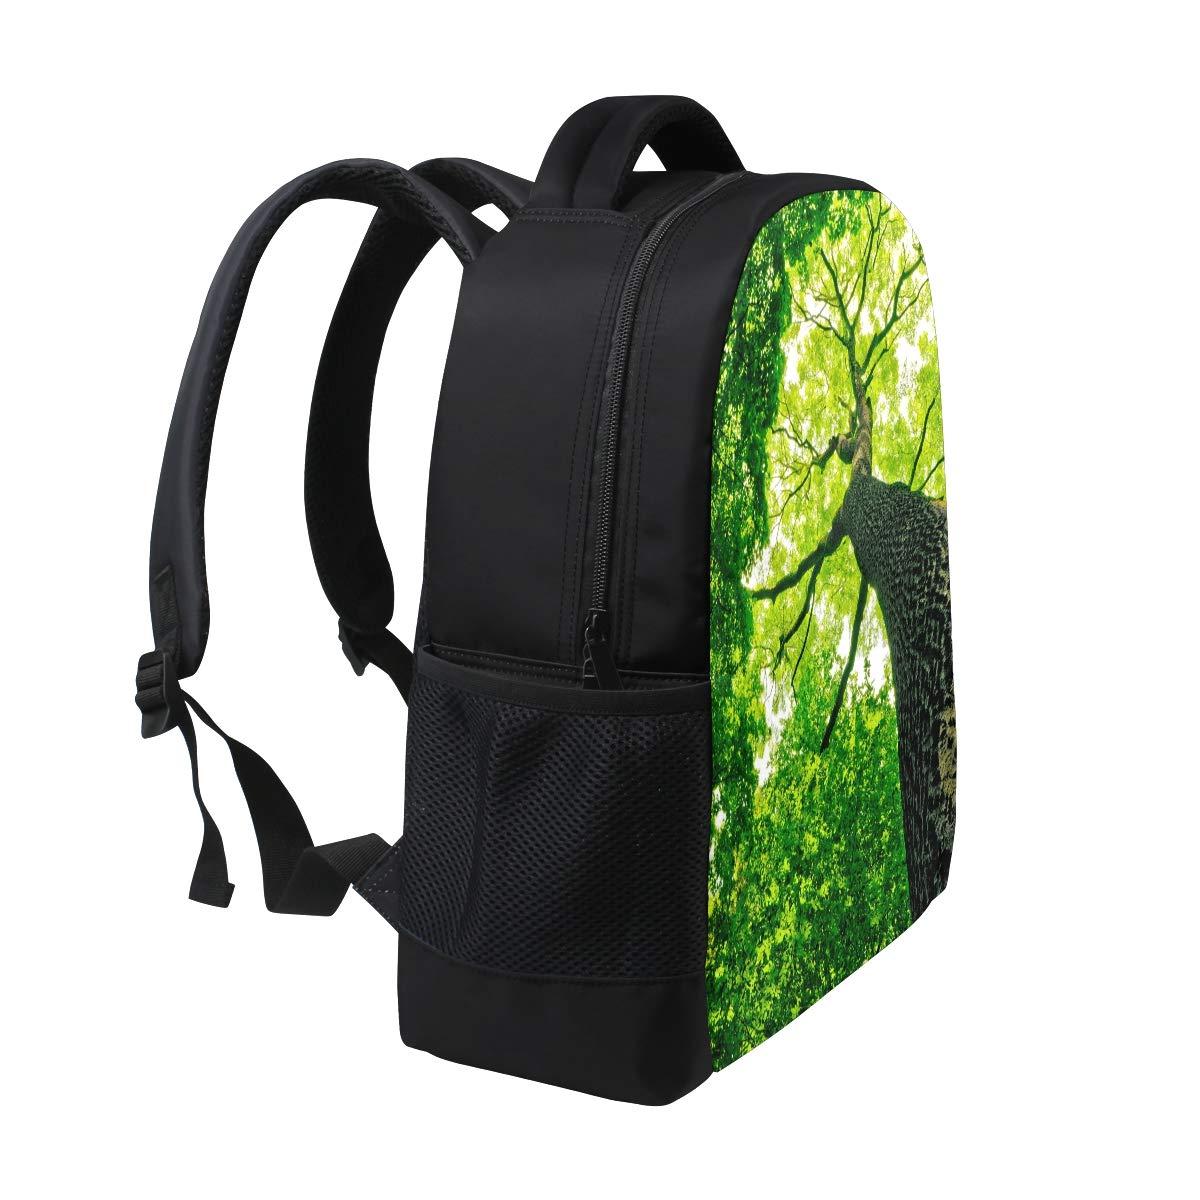 Amazon.com  TropicalLife Landscape Nature Scenery Tree Backpacks School  Bookbag Shoulder Zipper Backpack Hiking Travel Daypack Casual Bags   TropicalLife 4188ad1093